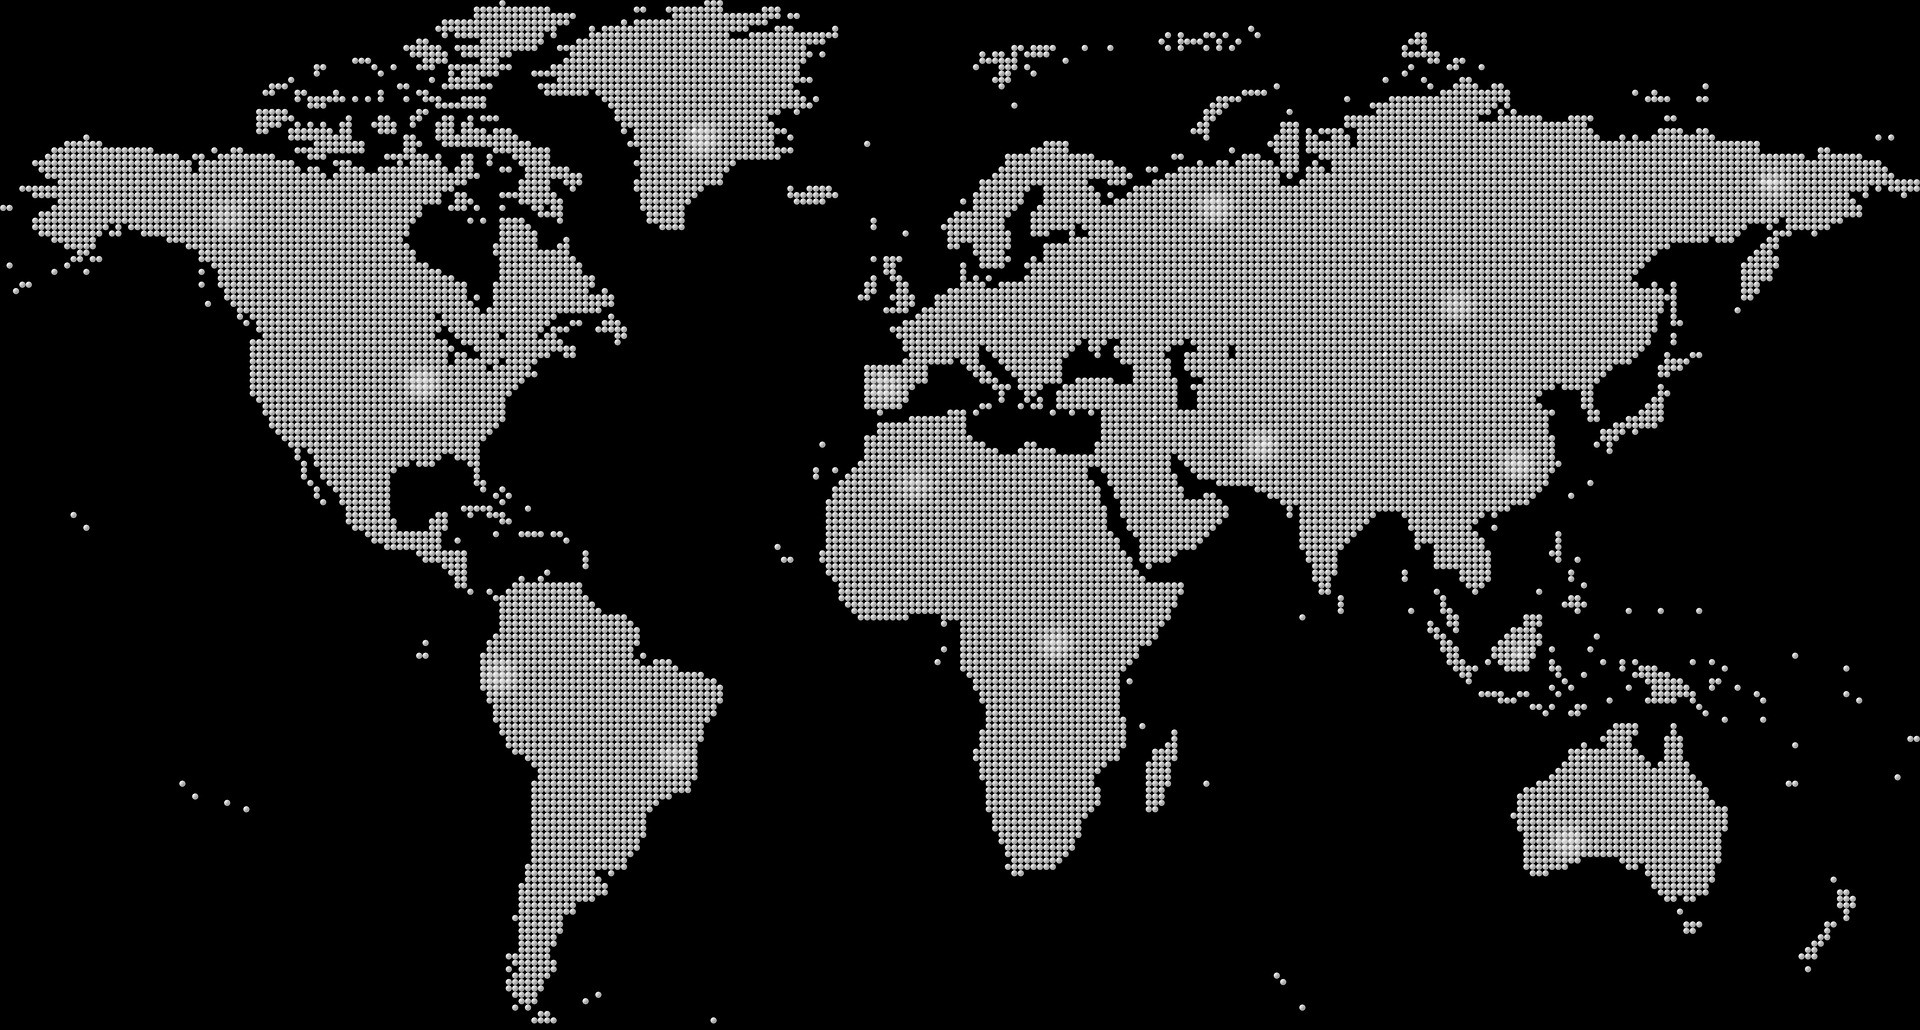 satellite tracking, gps, fleet, smartone, global star